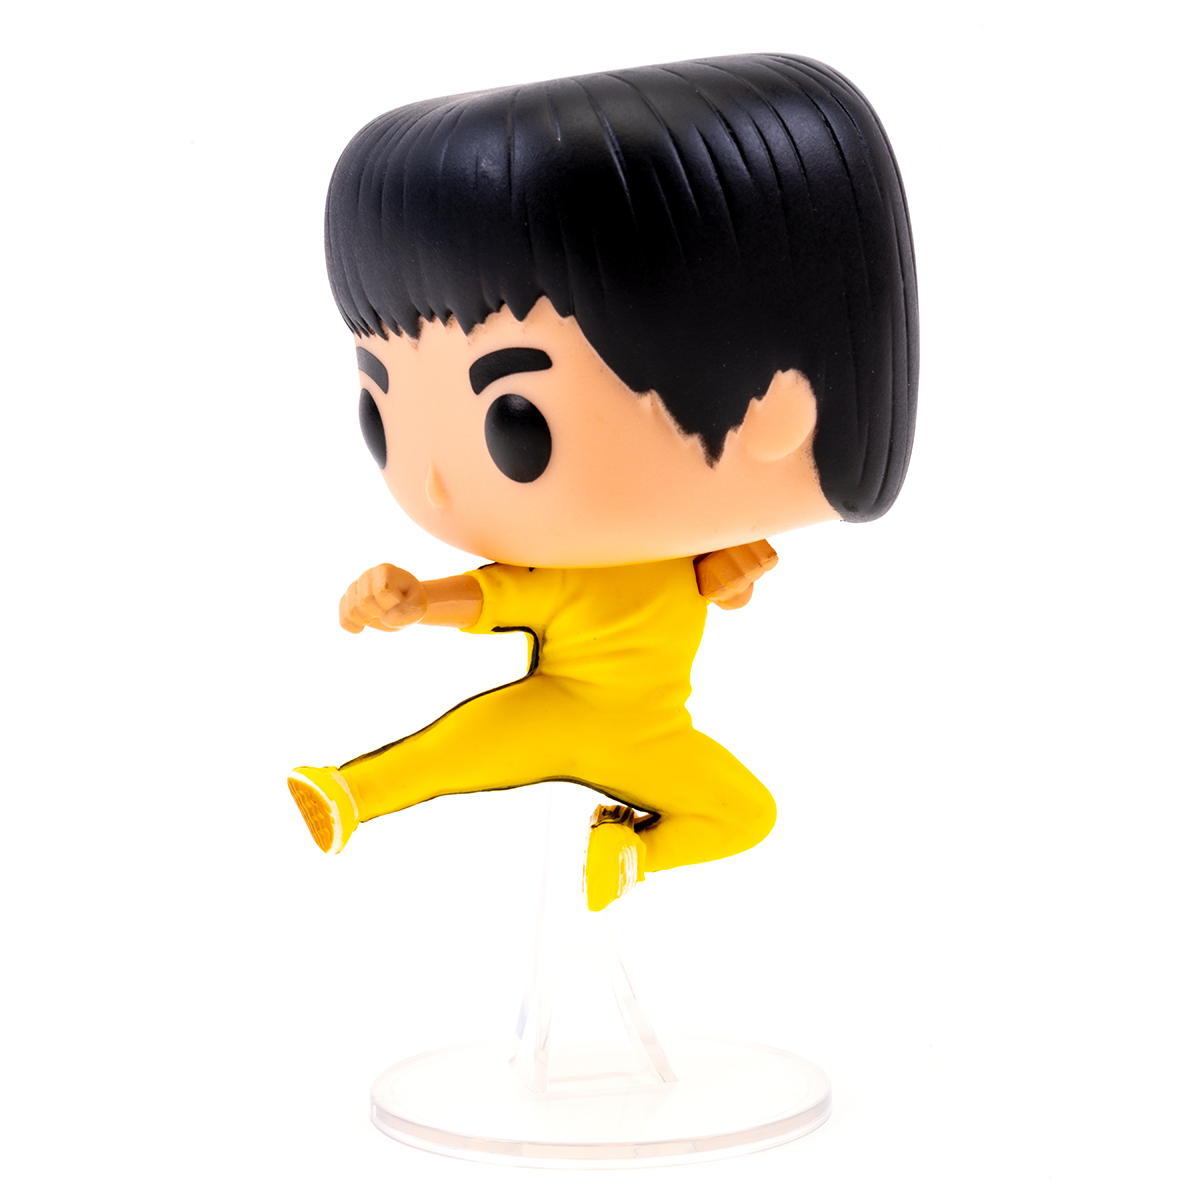 Bruce Lee Flying Kick Funko Pop Figurine